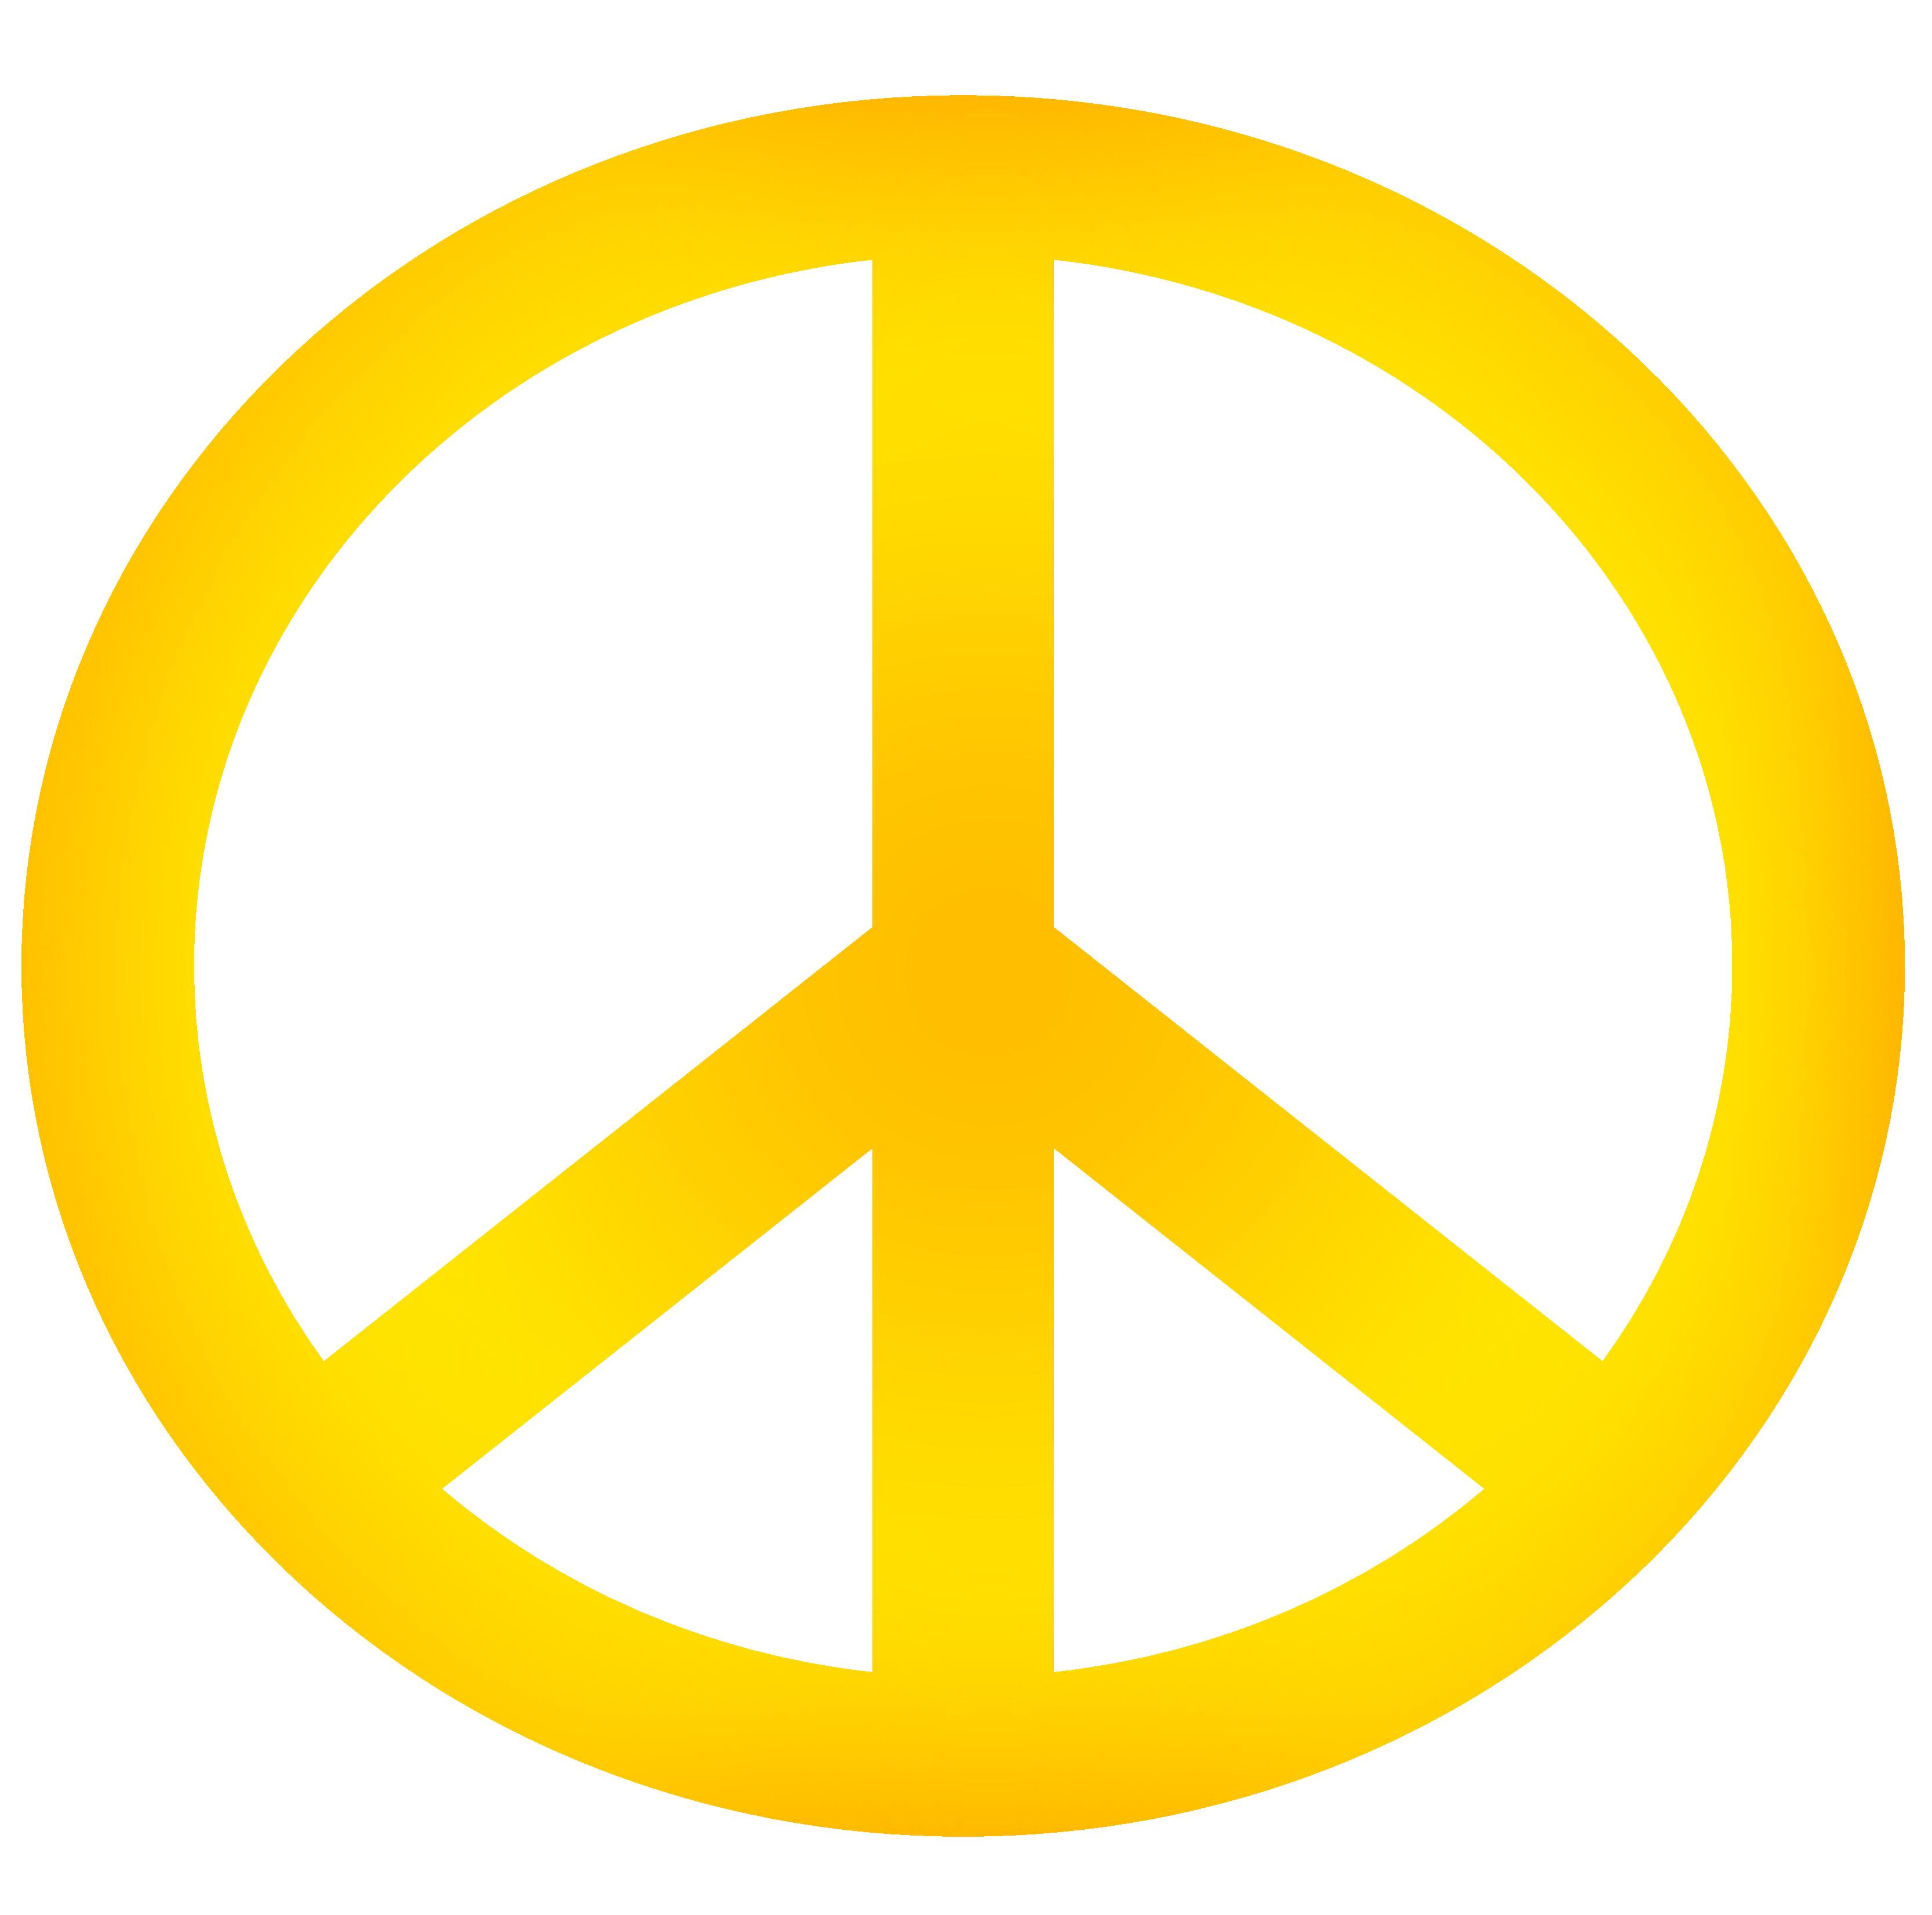 Download PNG Image - Peace Symbol Png Hd - Peace Symbol PNG